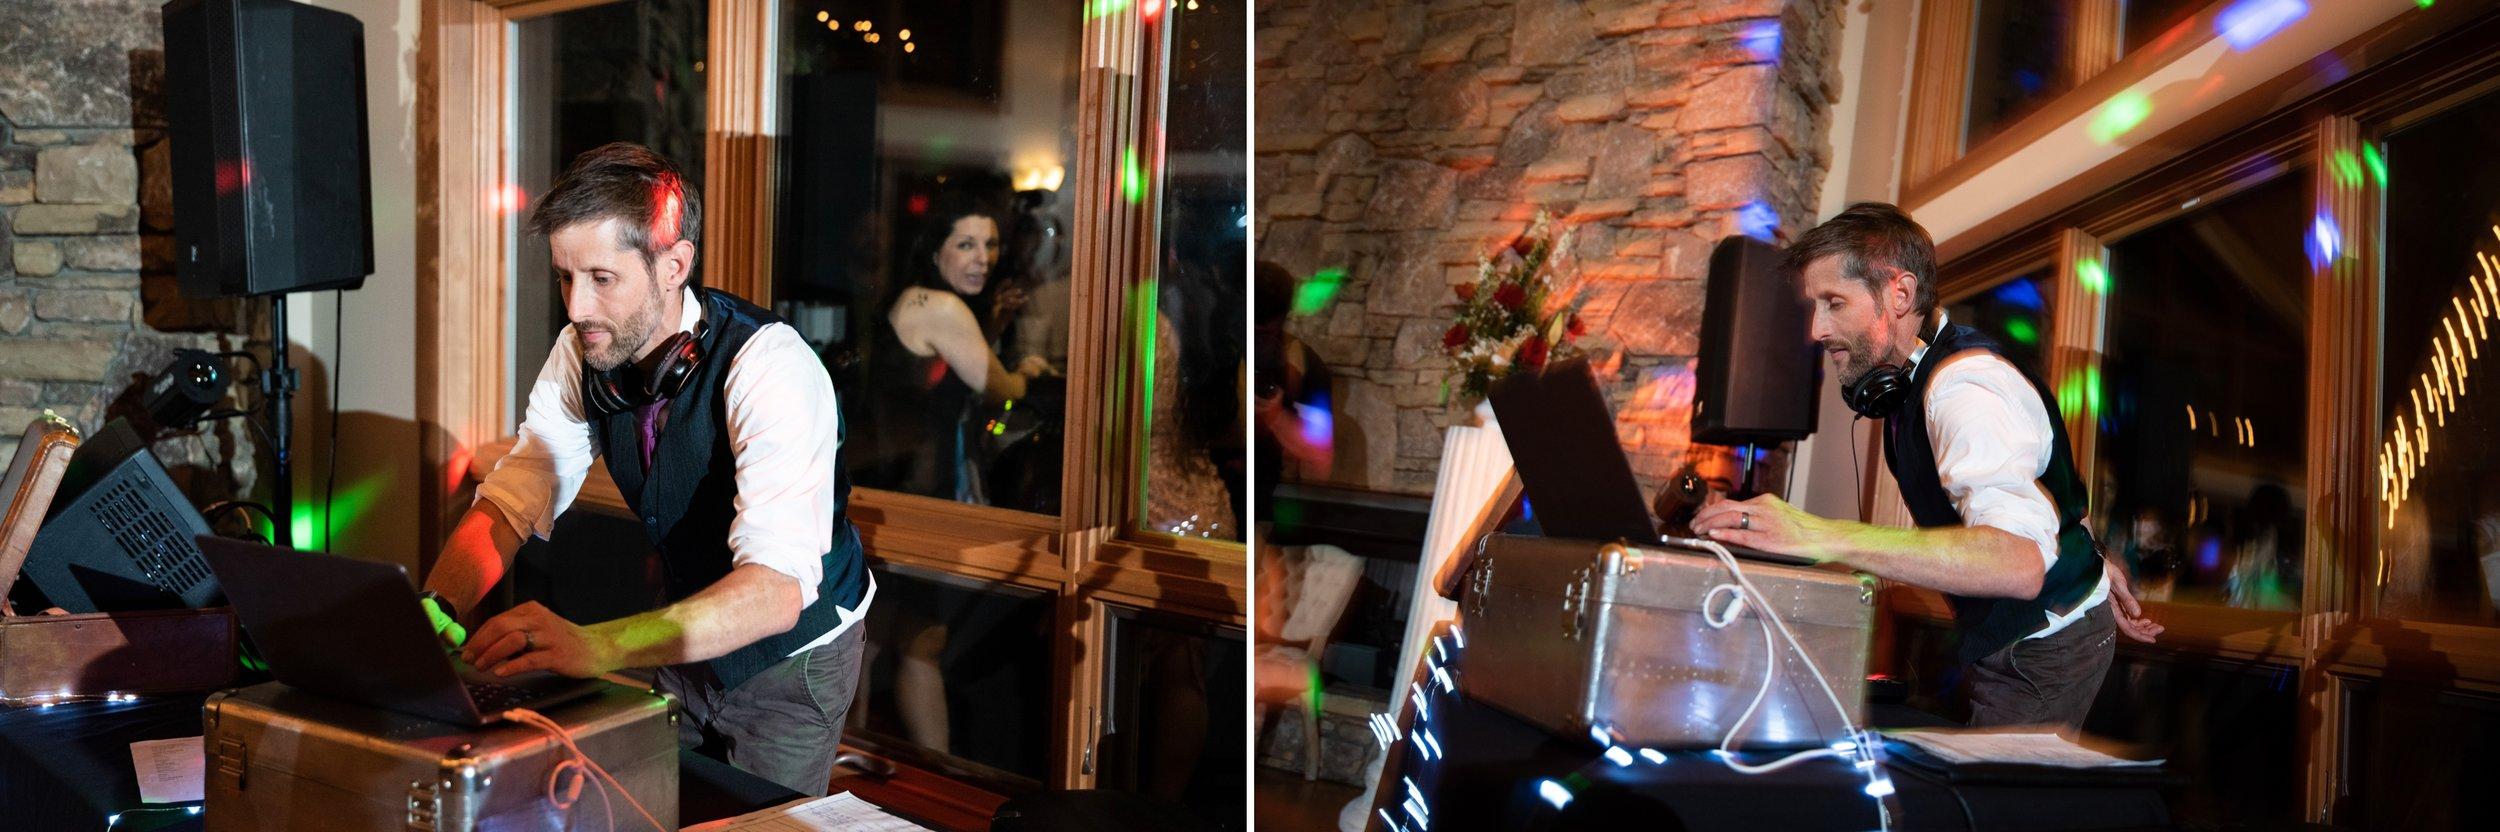 High Vista Weddings - Asheville Vendors 4 2.jpg